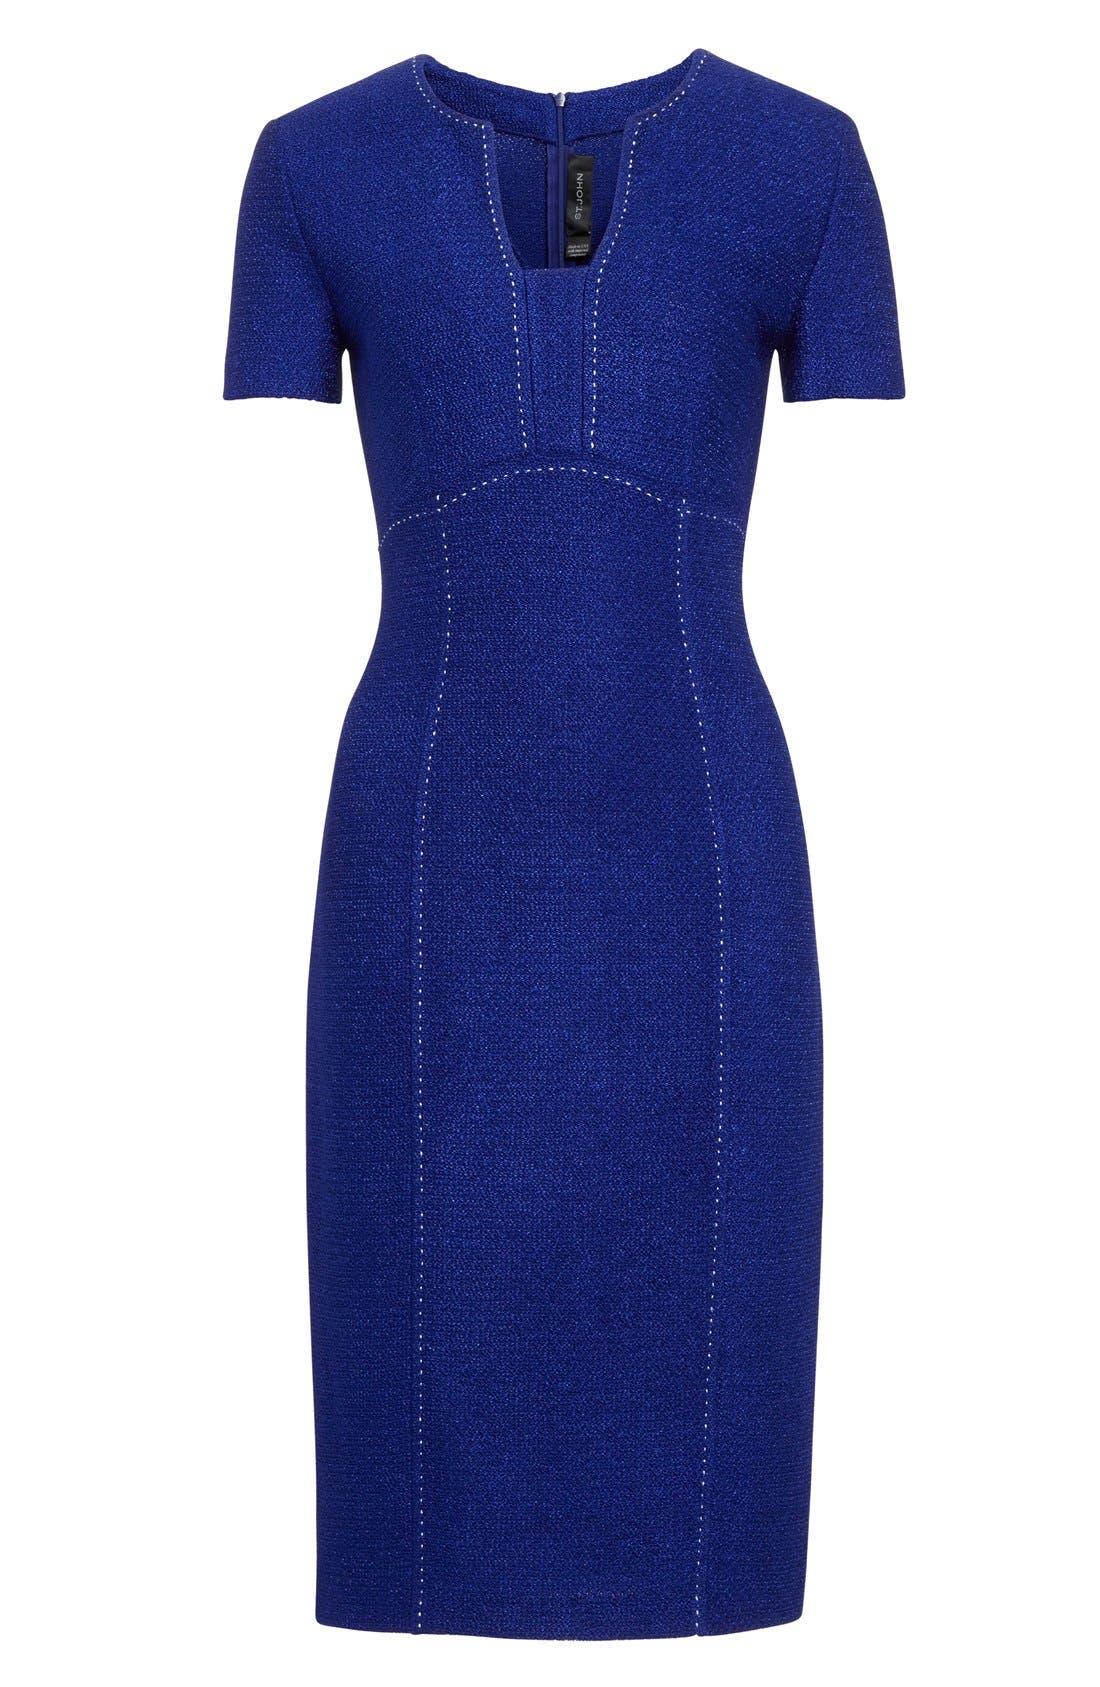 Alternate Image 4  - St. John Collection 'Newport' Knit Sheath Dress